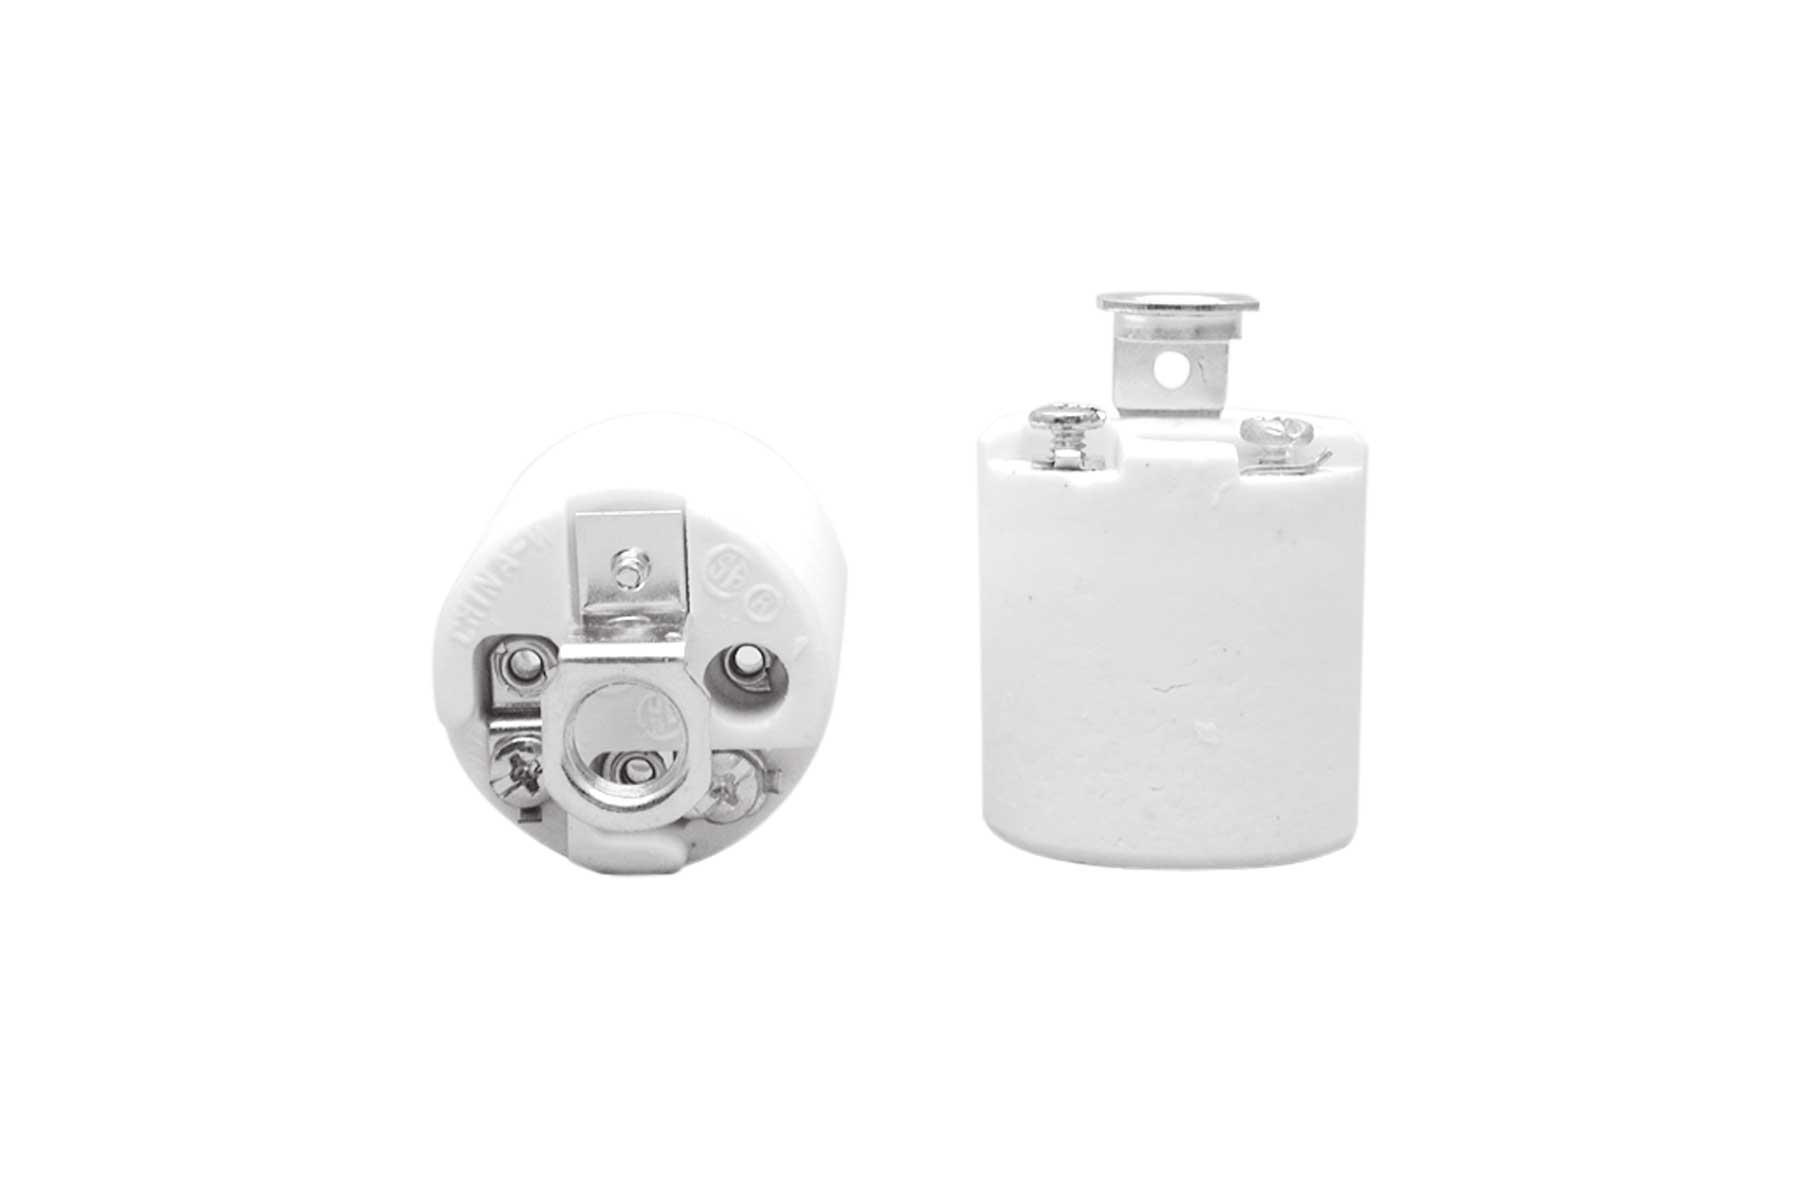 Medium Base Porcelain Keyless Incandescent Light Socket with Screw Terminal